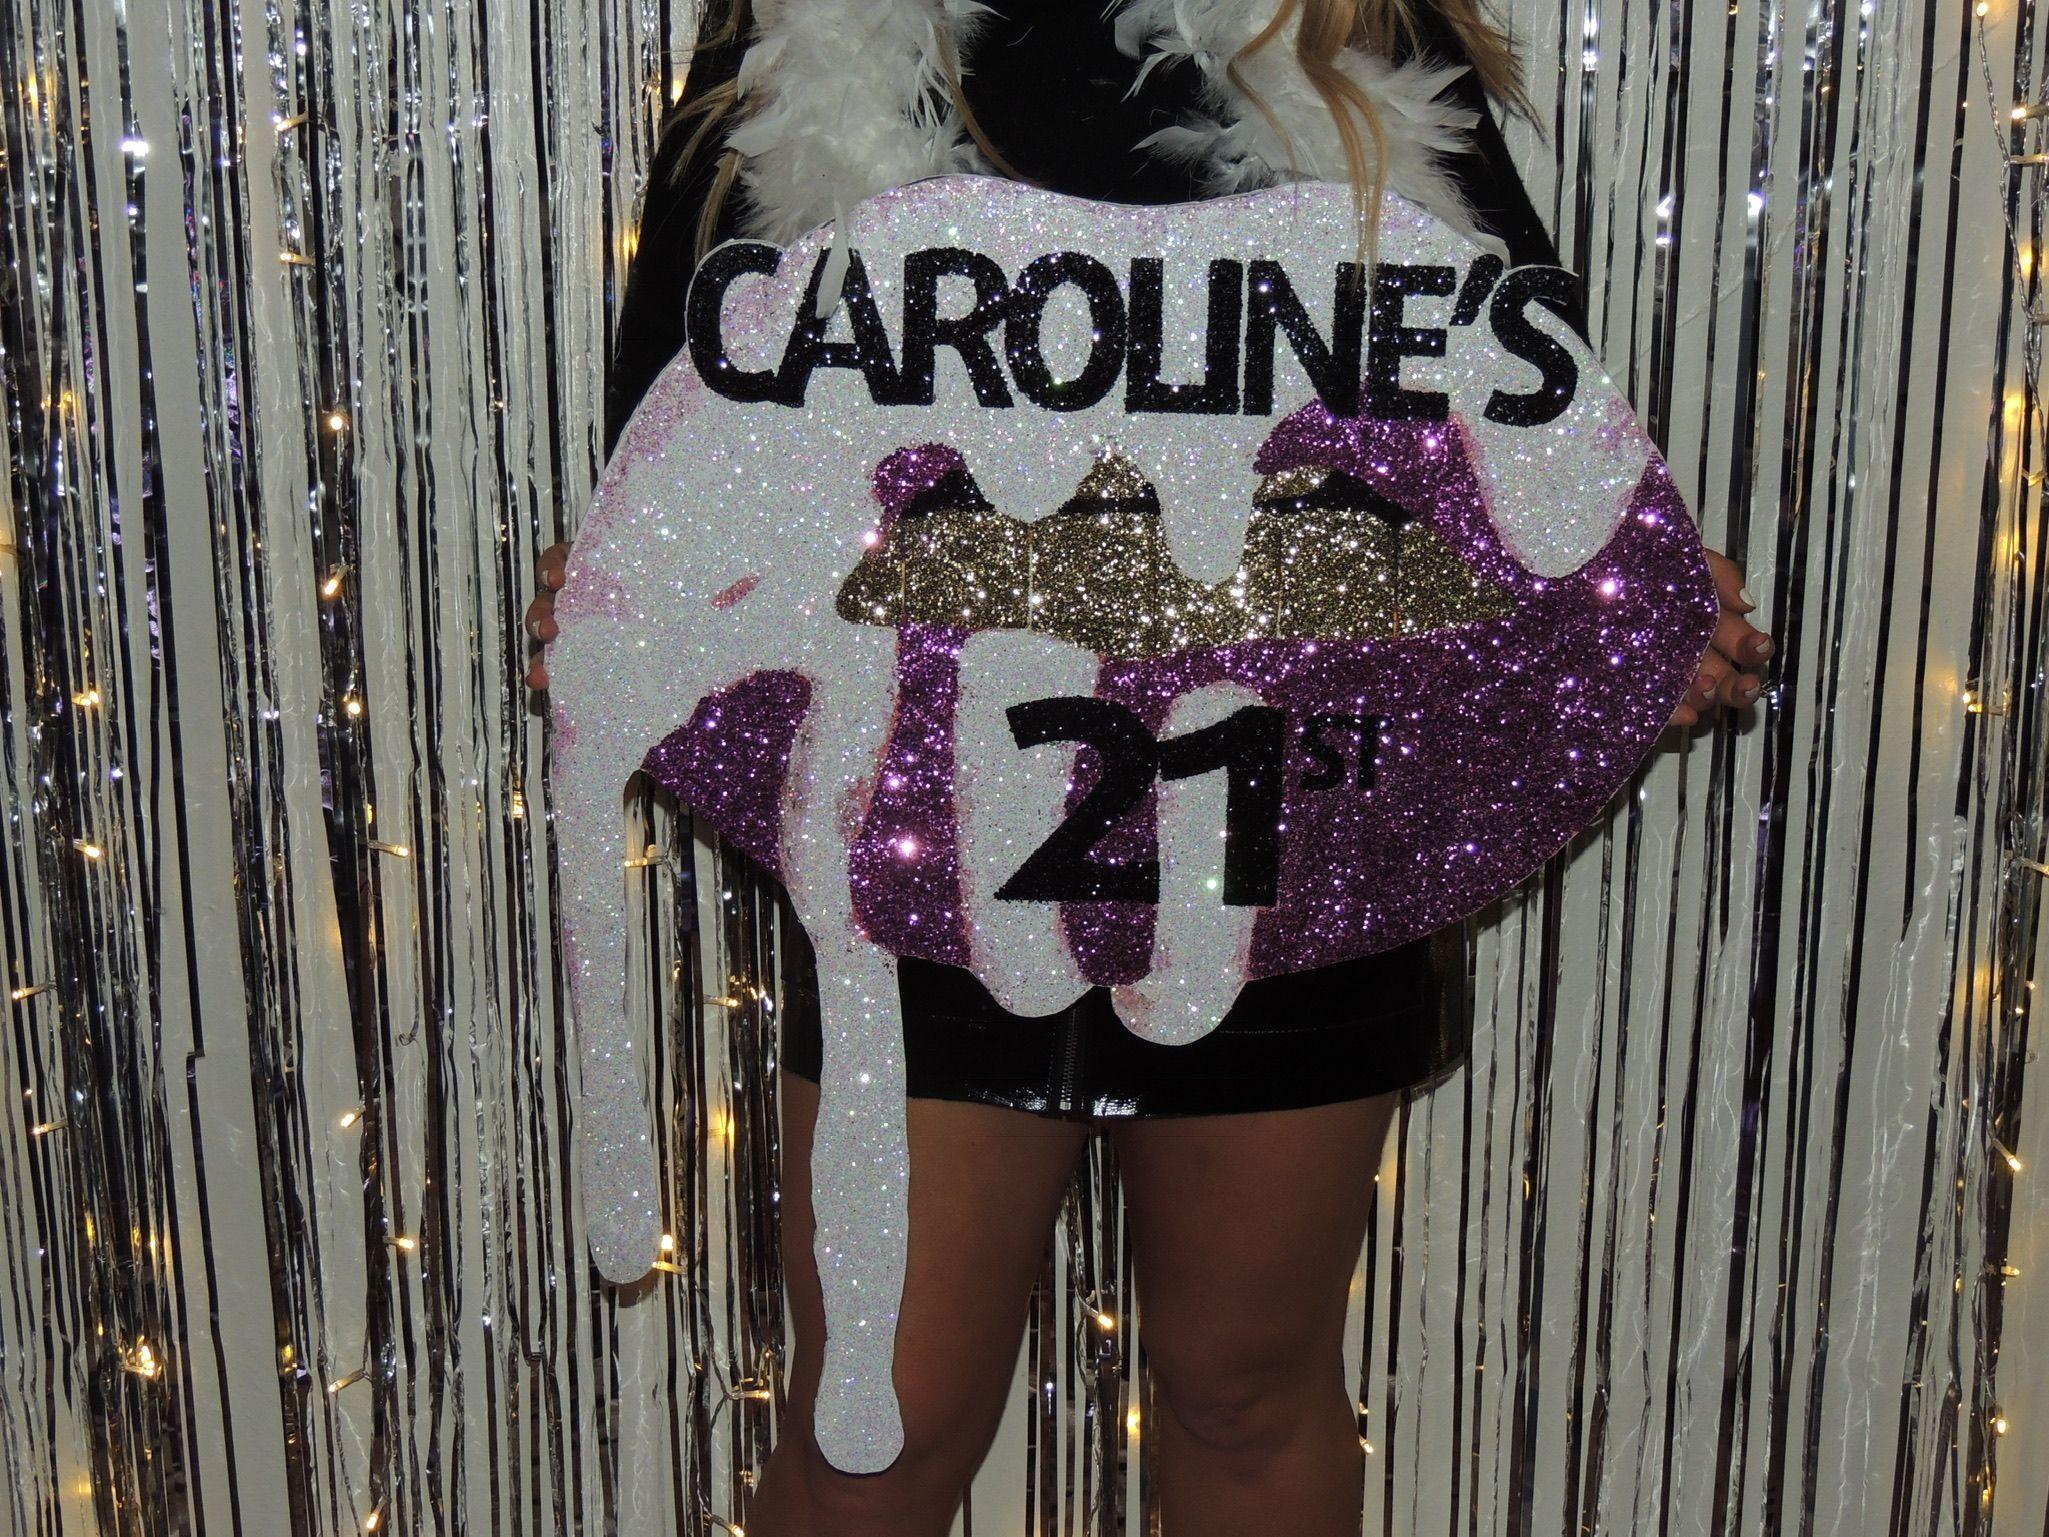 21st birthday sign!! #21stbirthdaysigns